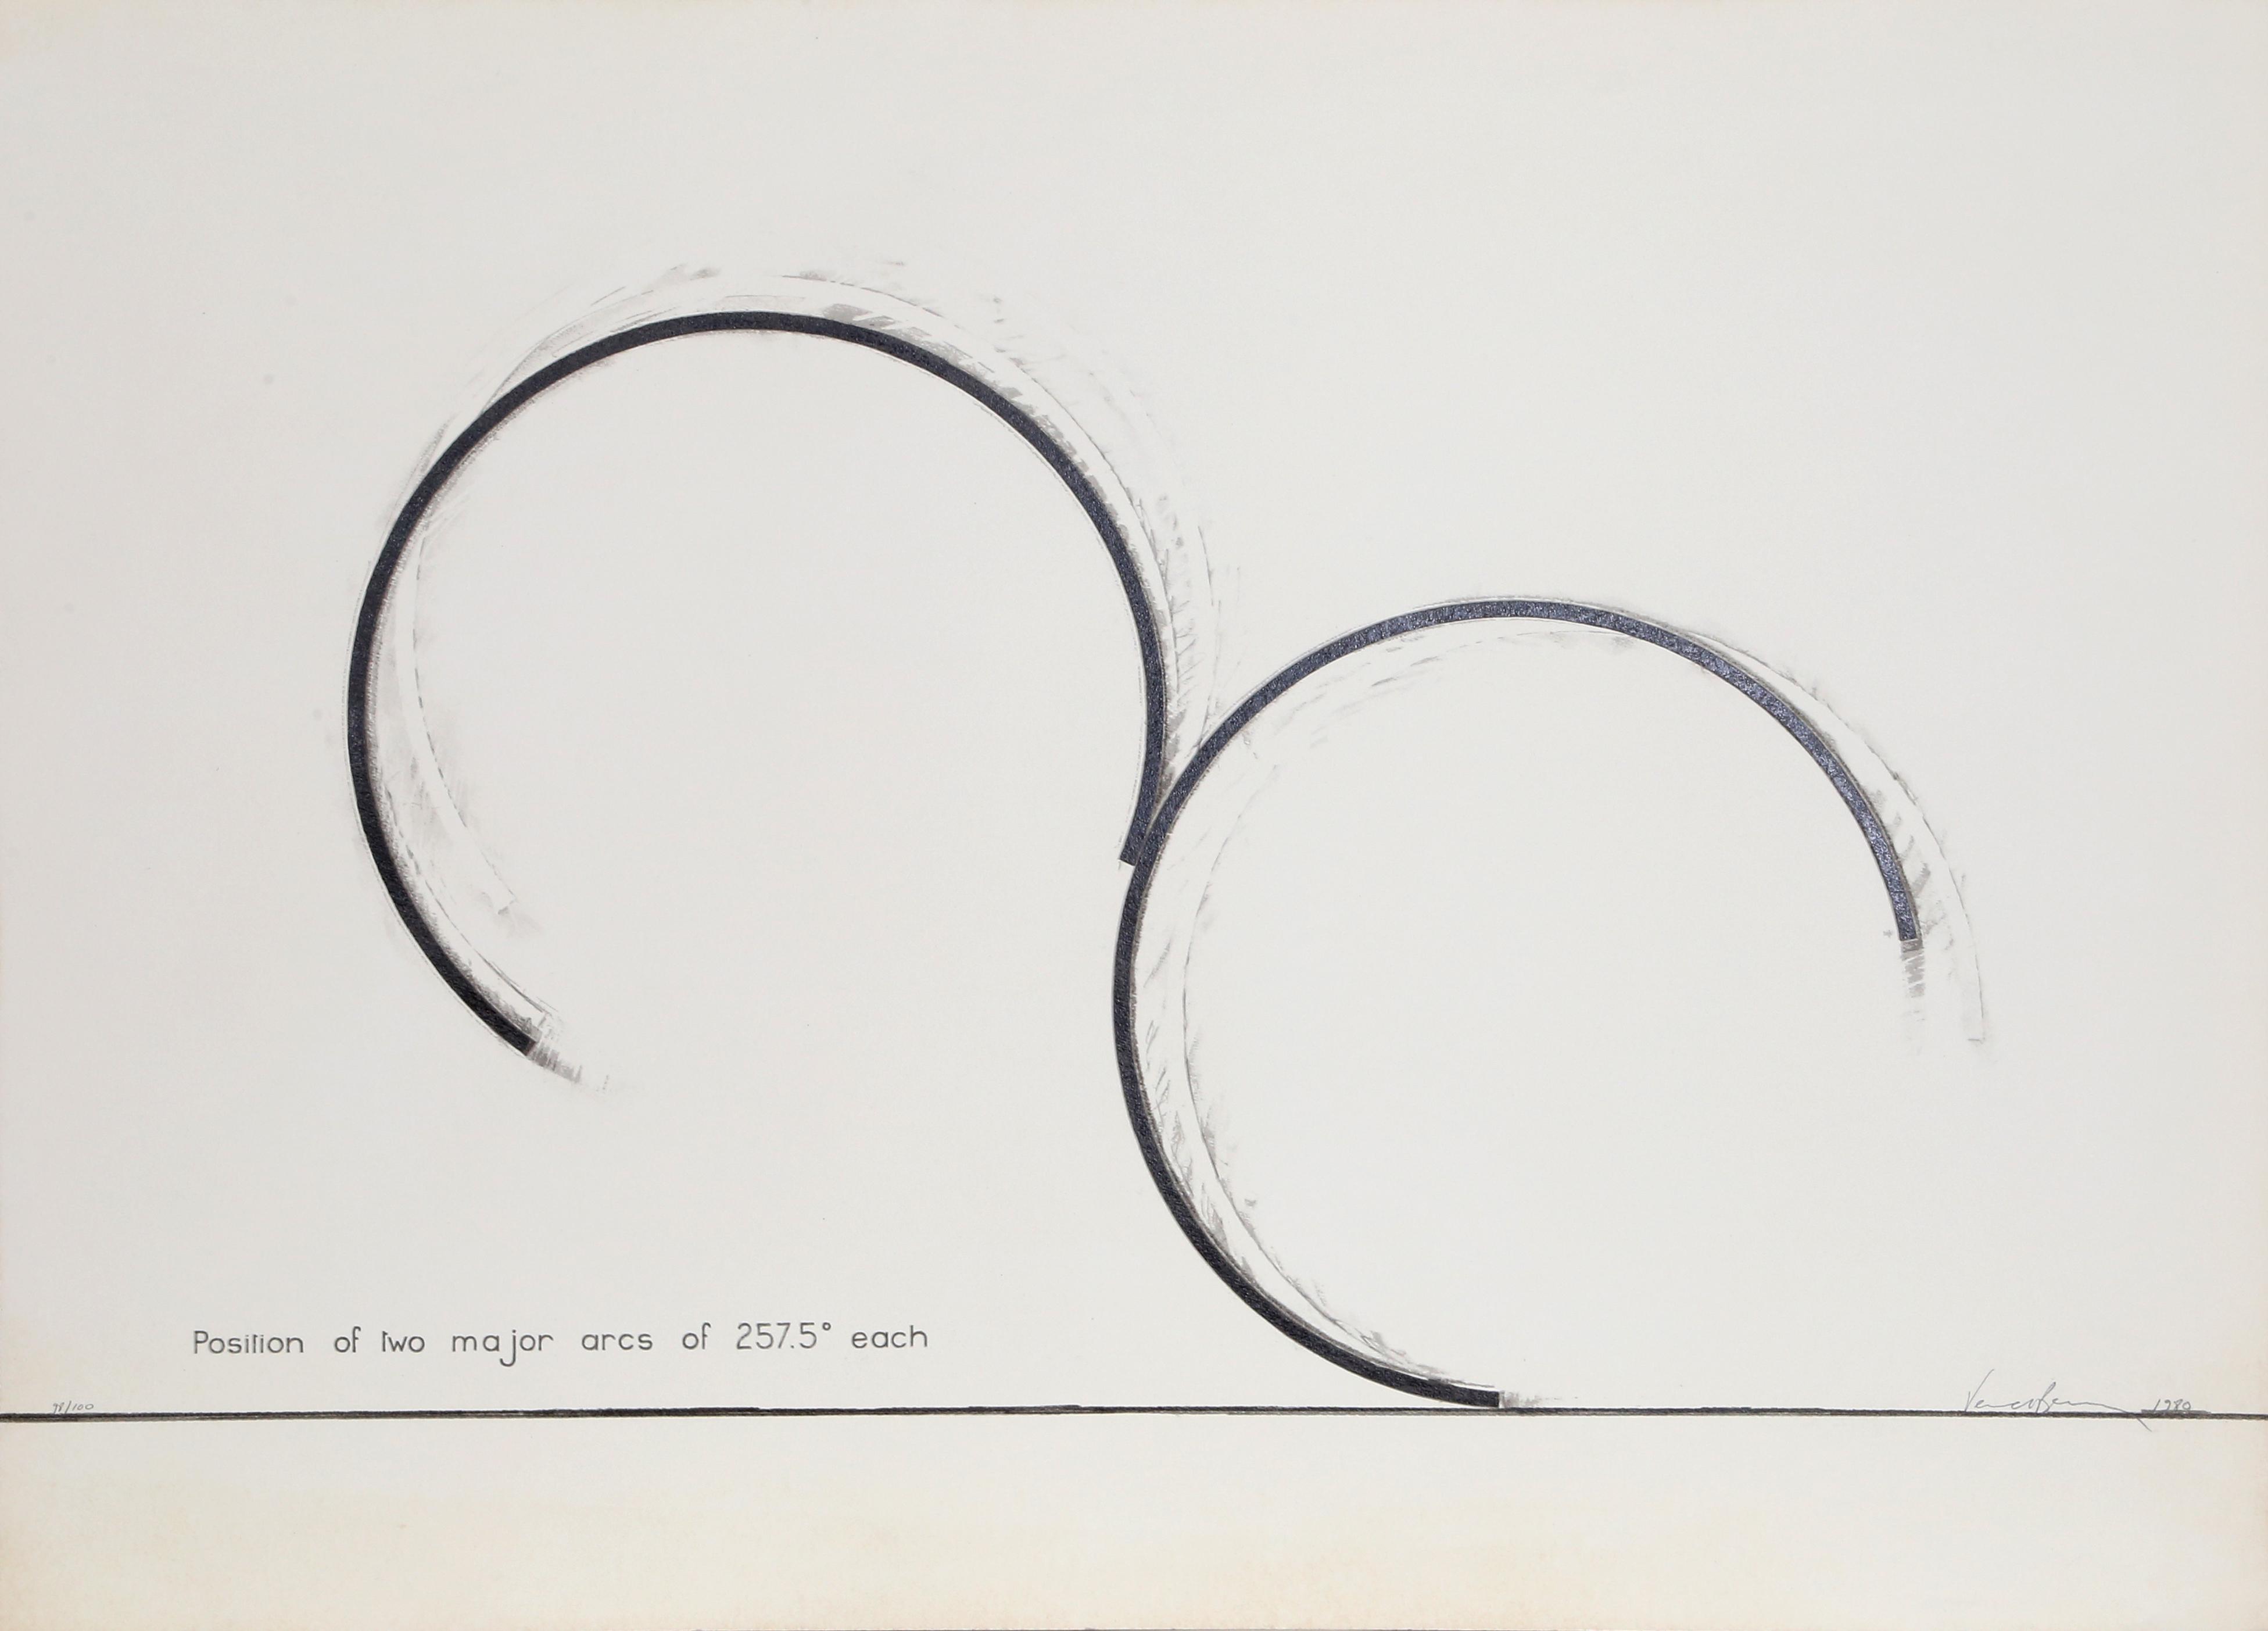 Bernar Venet, Position of Two Major Arcs of 257.5 Degrees Each, Screenprint